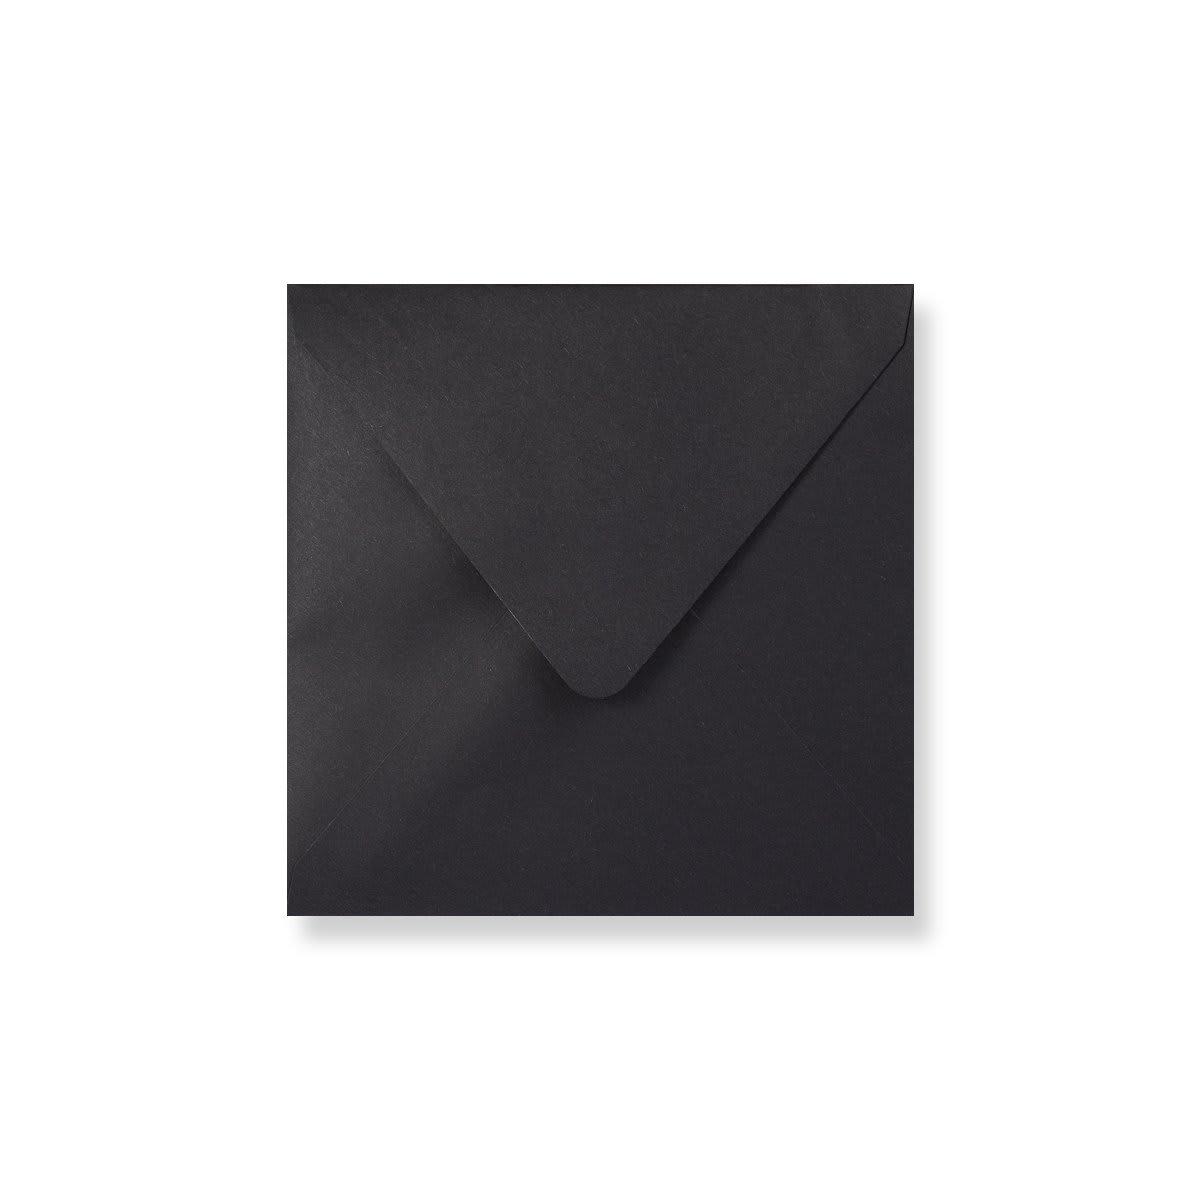 160 x 160mm Black Envelopes Lined With Black Paper